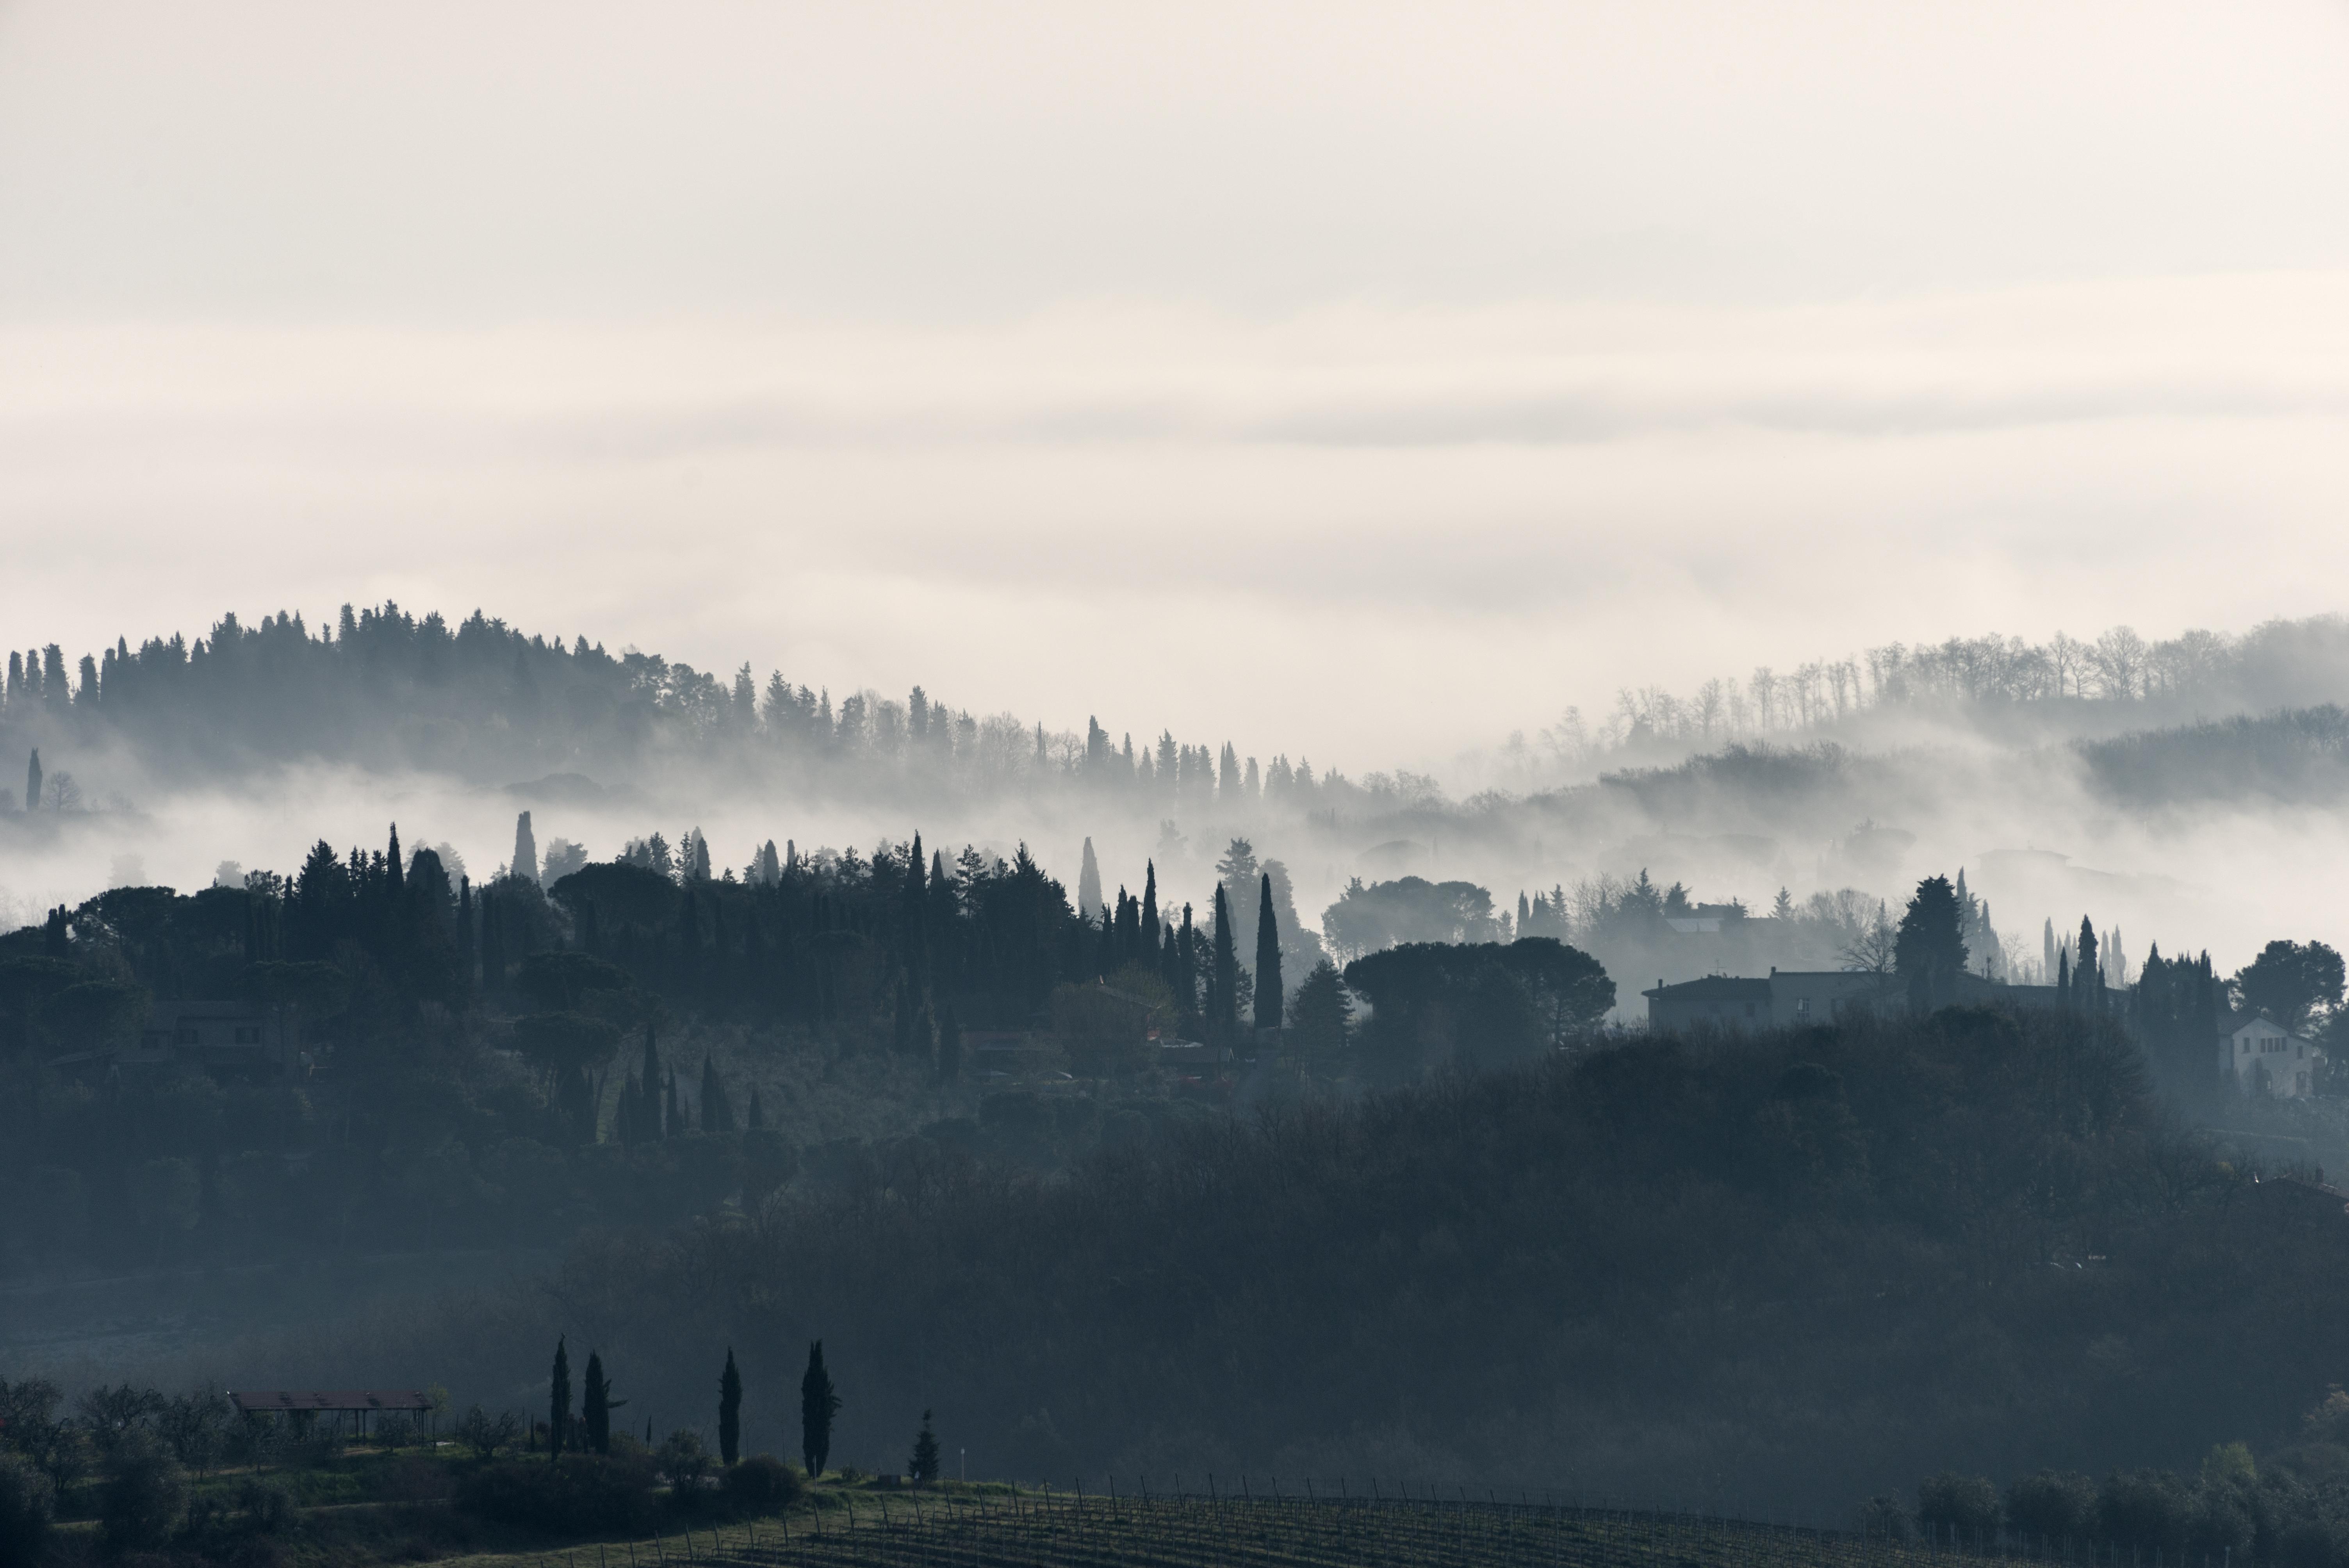 Morning - San Gimignano, Siena, Italy - March 27, 2016 02.jpg